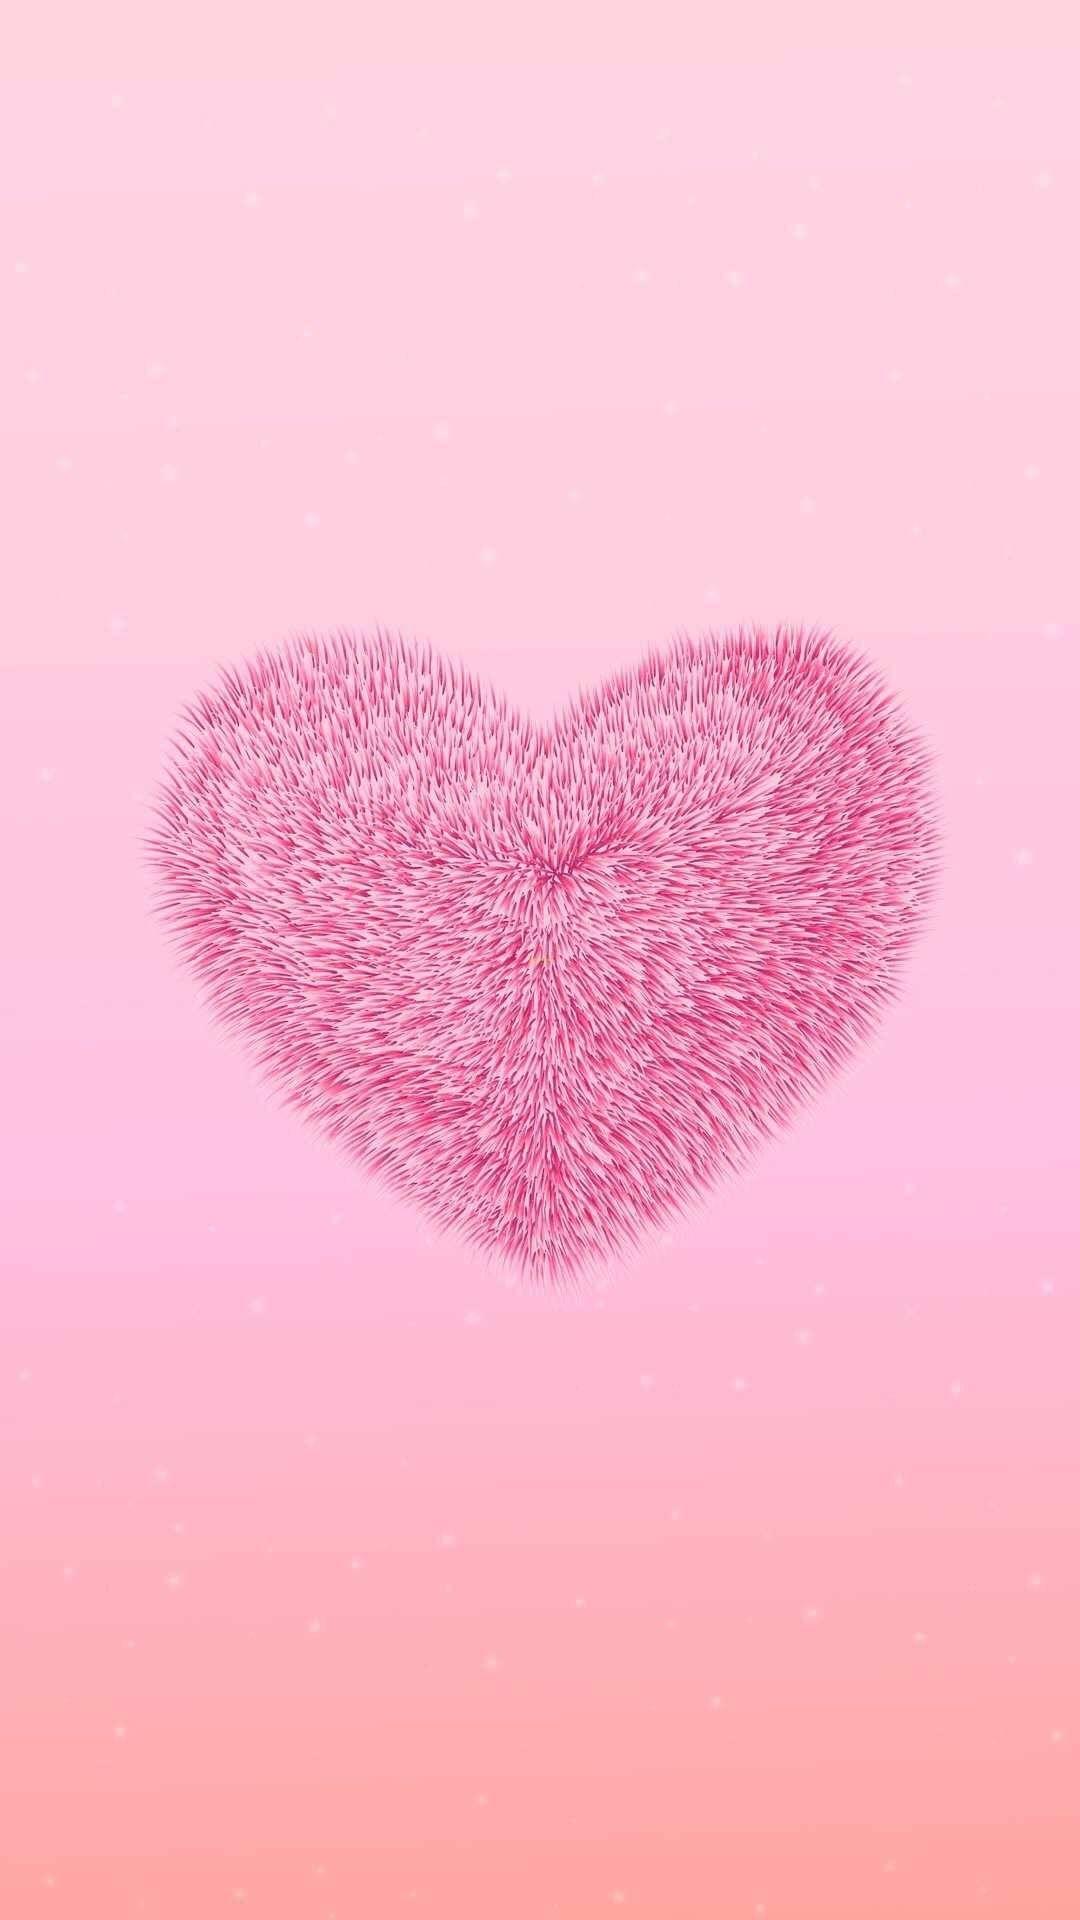 Fuzzy Heart 100 Iphone In 2021 Pink Wallpaper Backgrounds Pink Wallpaper Iphone Iphone Wallpaper Love iphone cute pink hd wallpaper